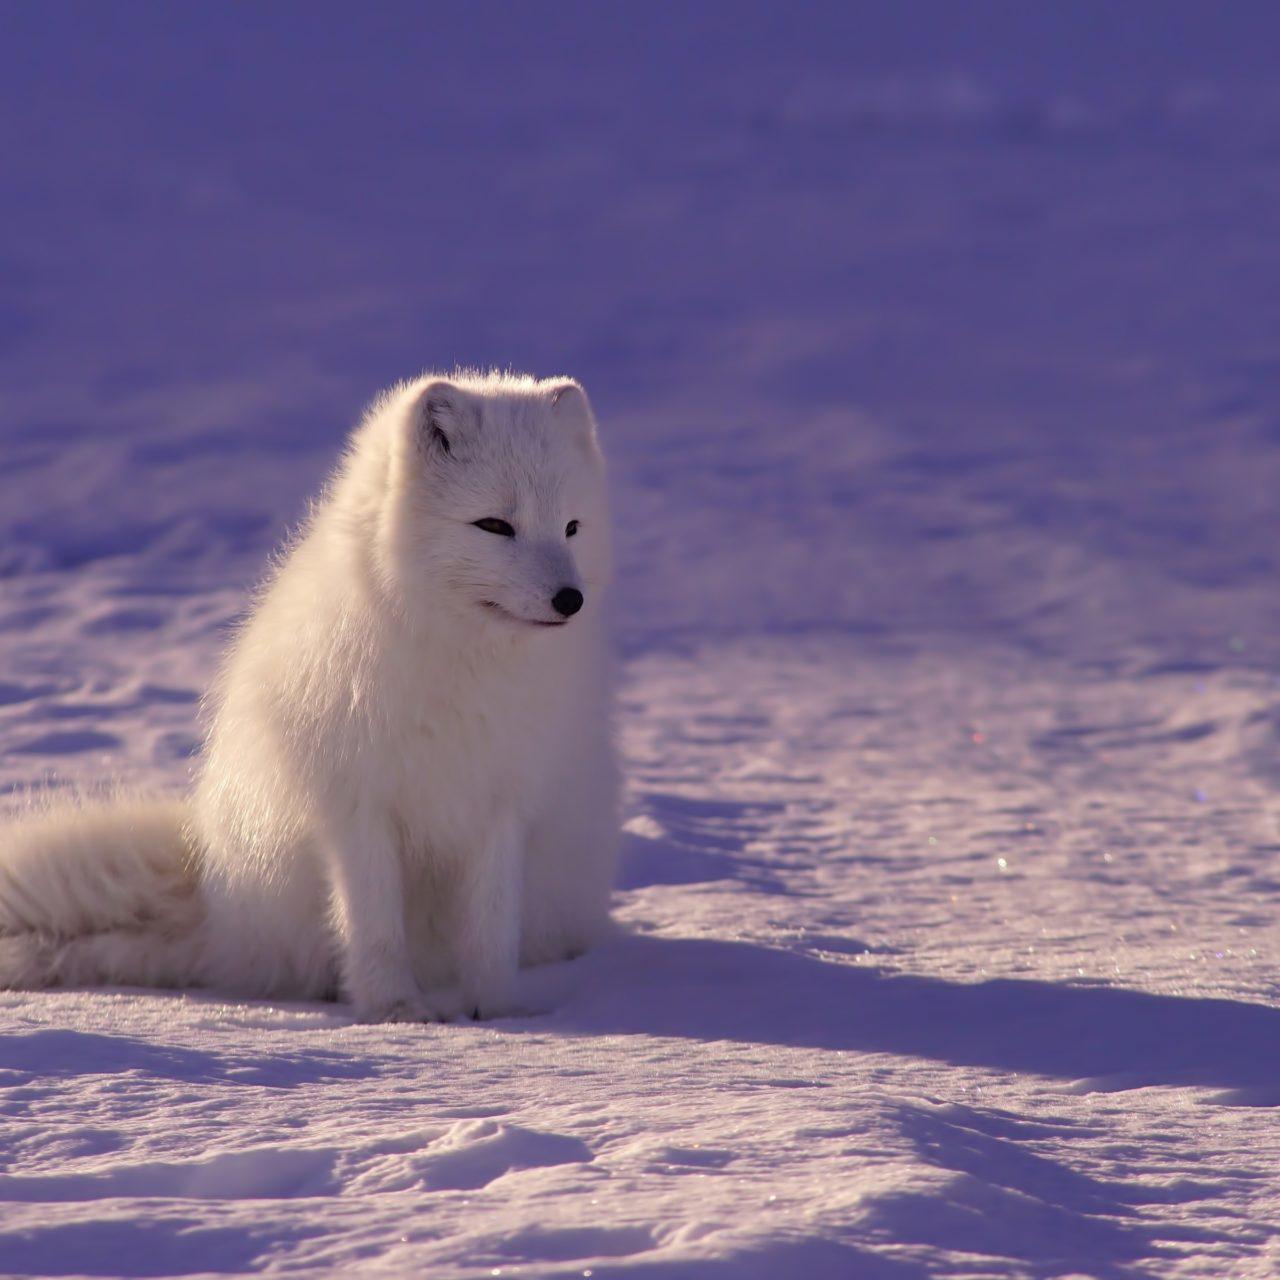 Iphone 5s Wallpaper: Arctic Fox Wallpaper